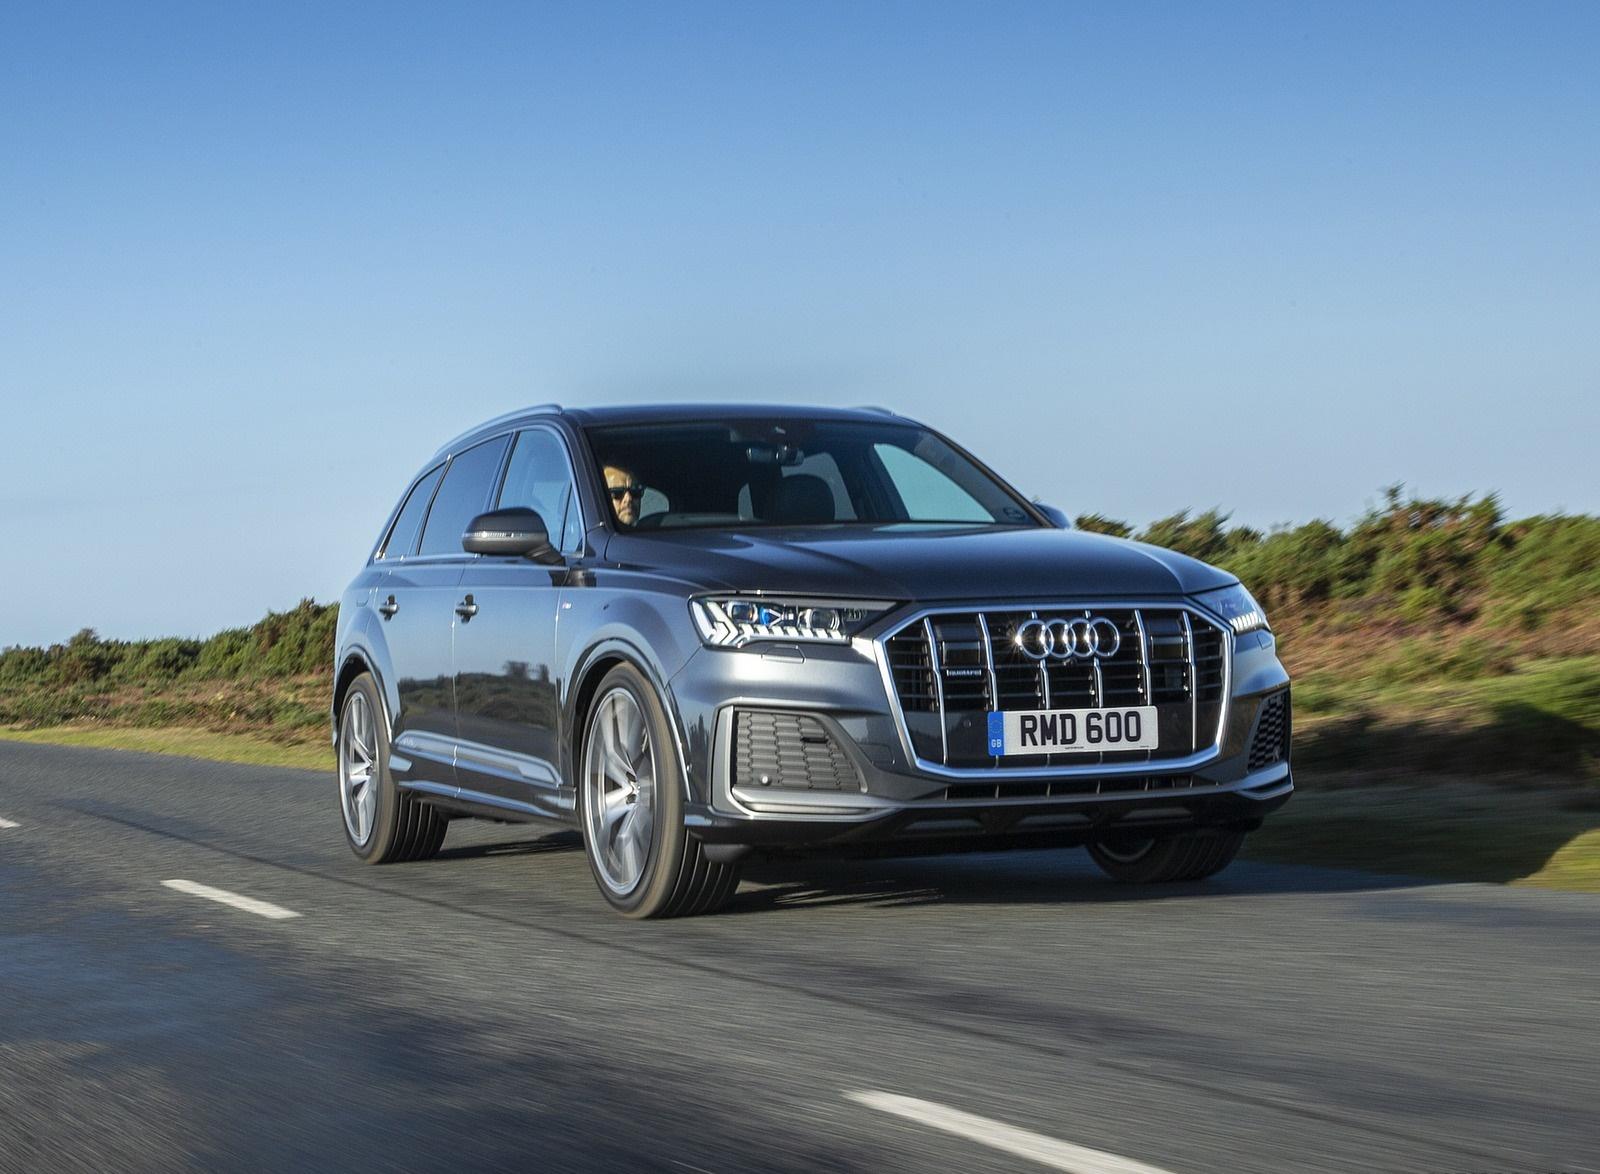 2020 Audi Q7 (UK-Spec) Front Three-Quarter Wallpapers (1)